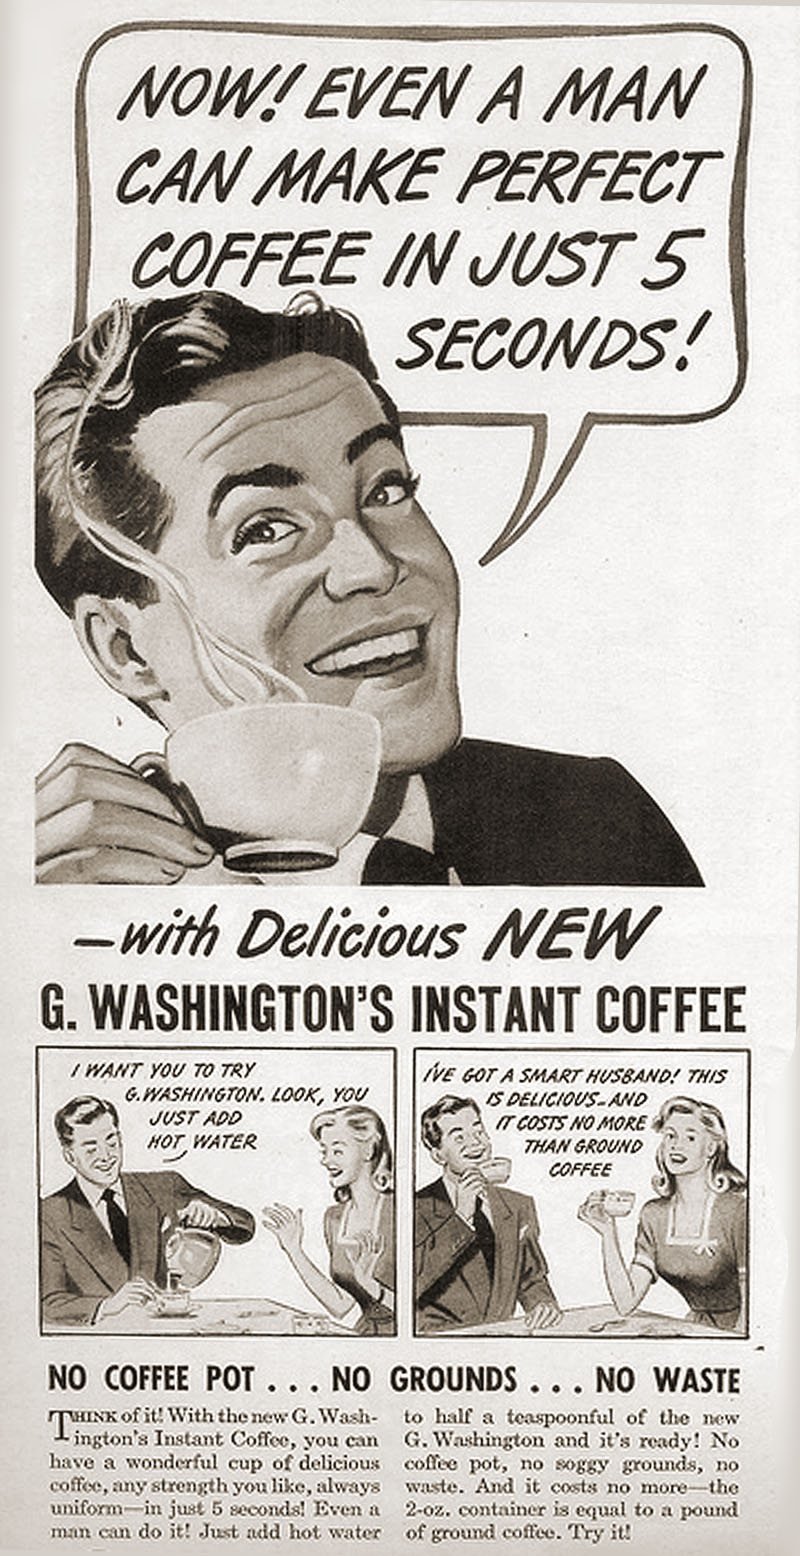 Vintage sexist advertisements